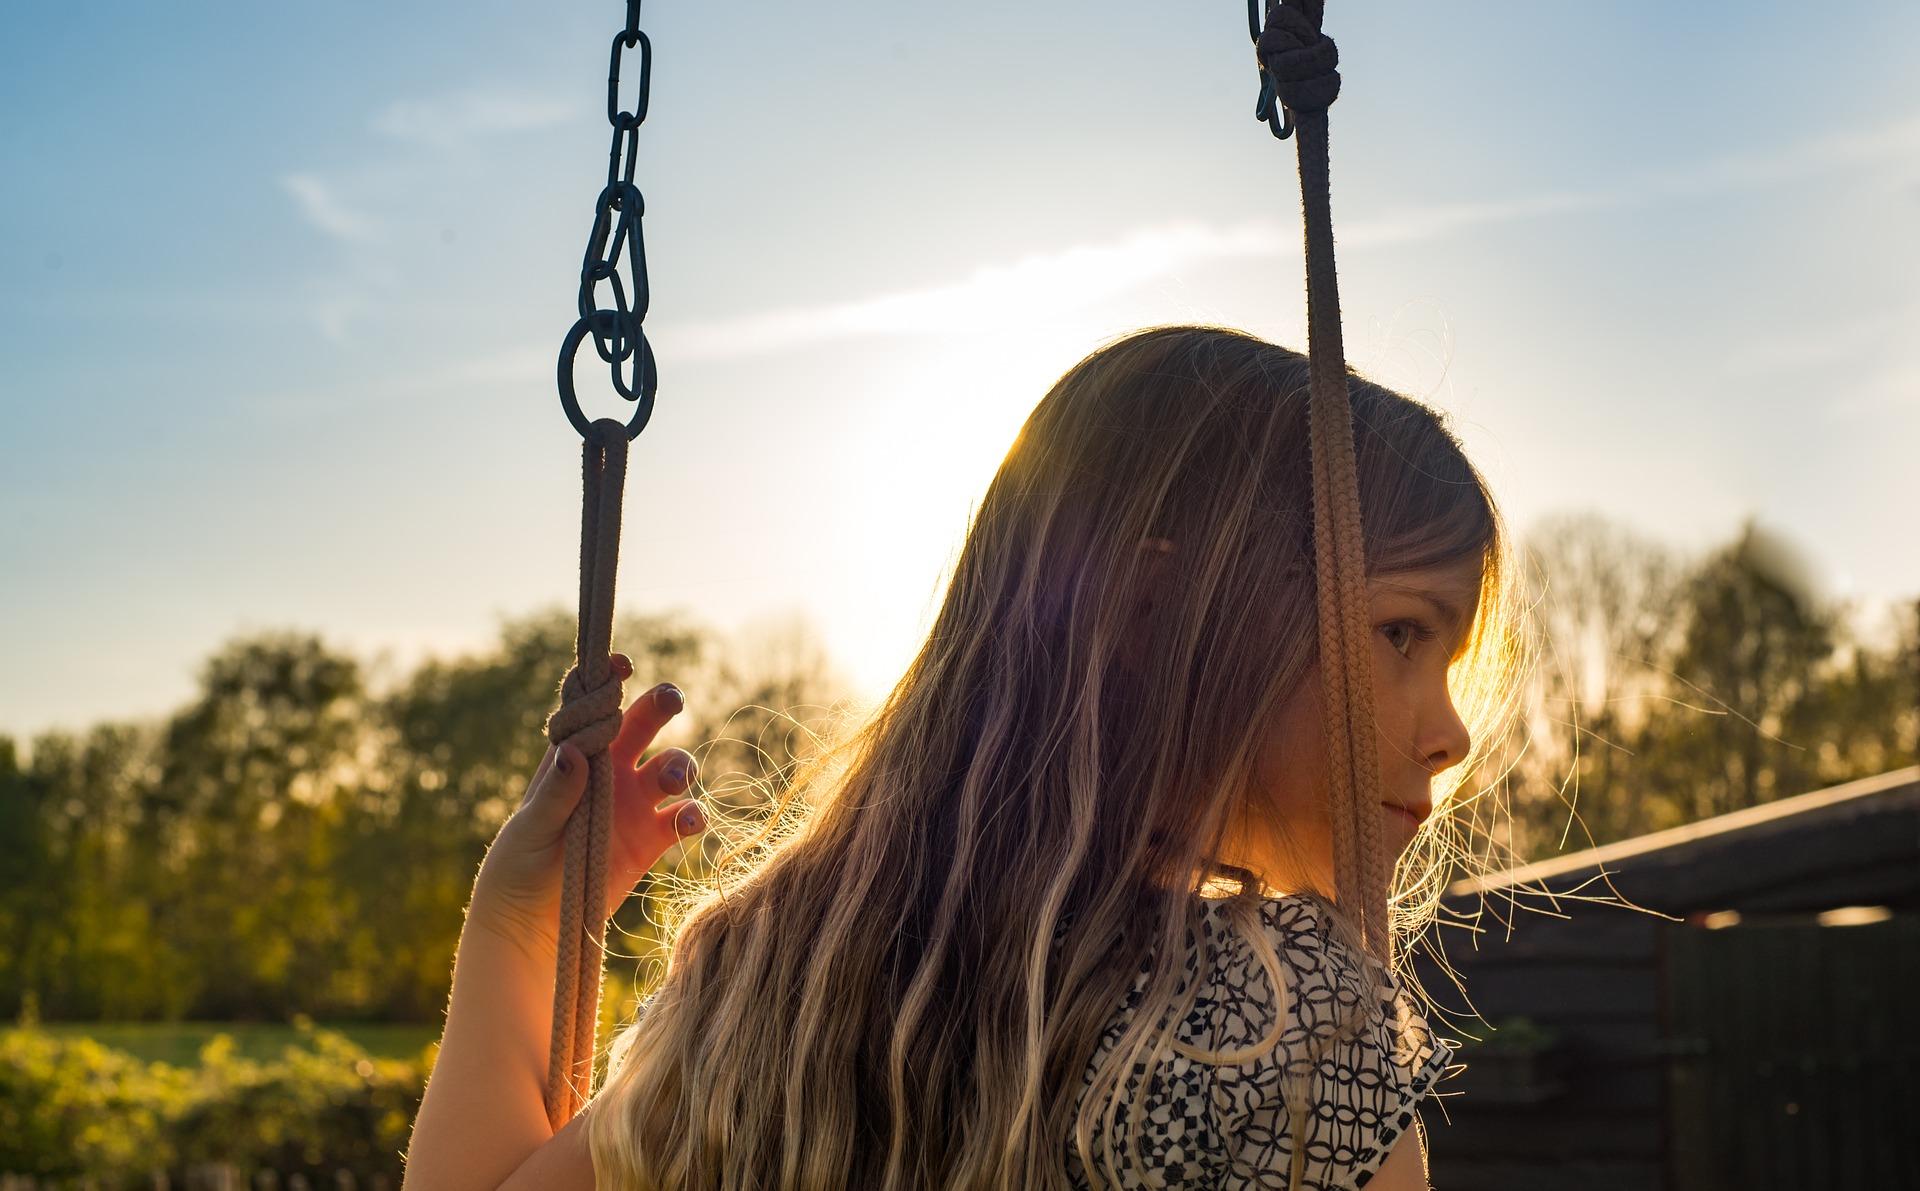 diy backyard playground ideas for girls